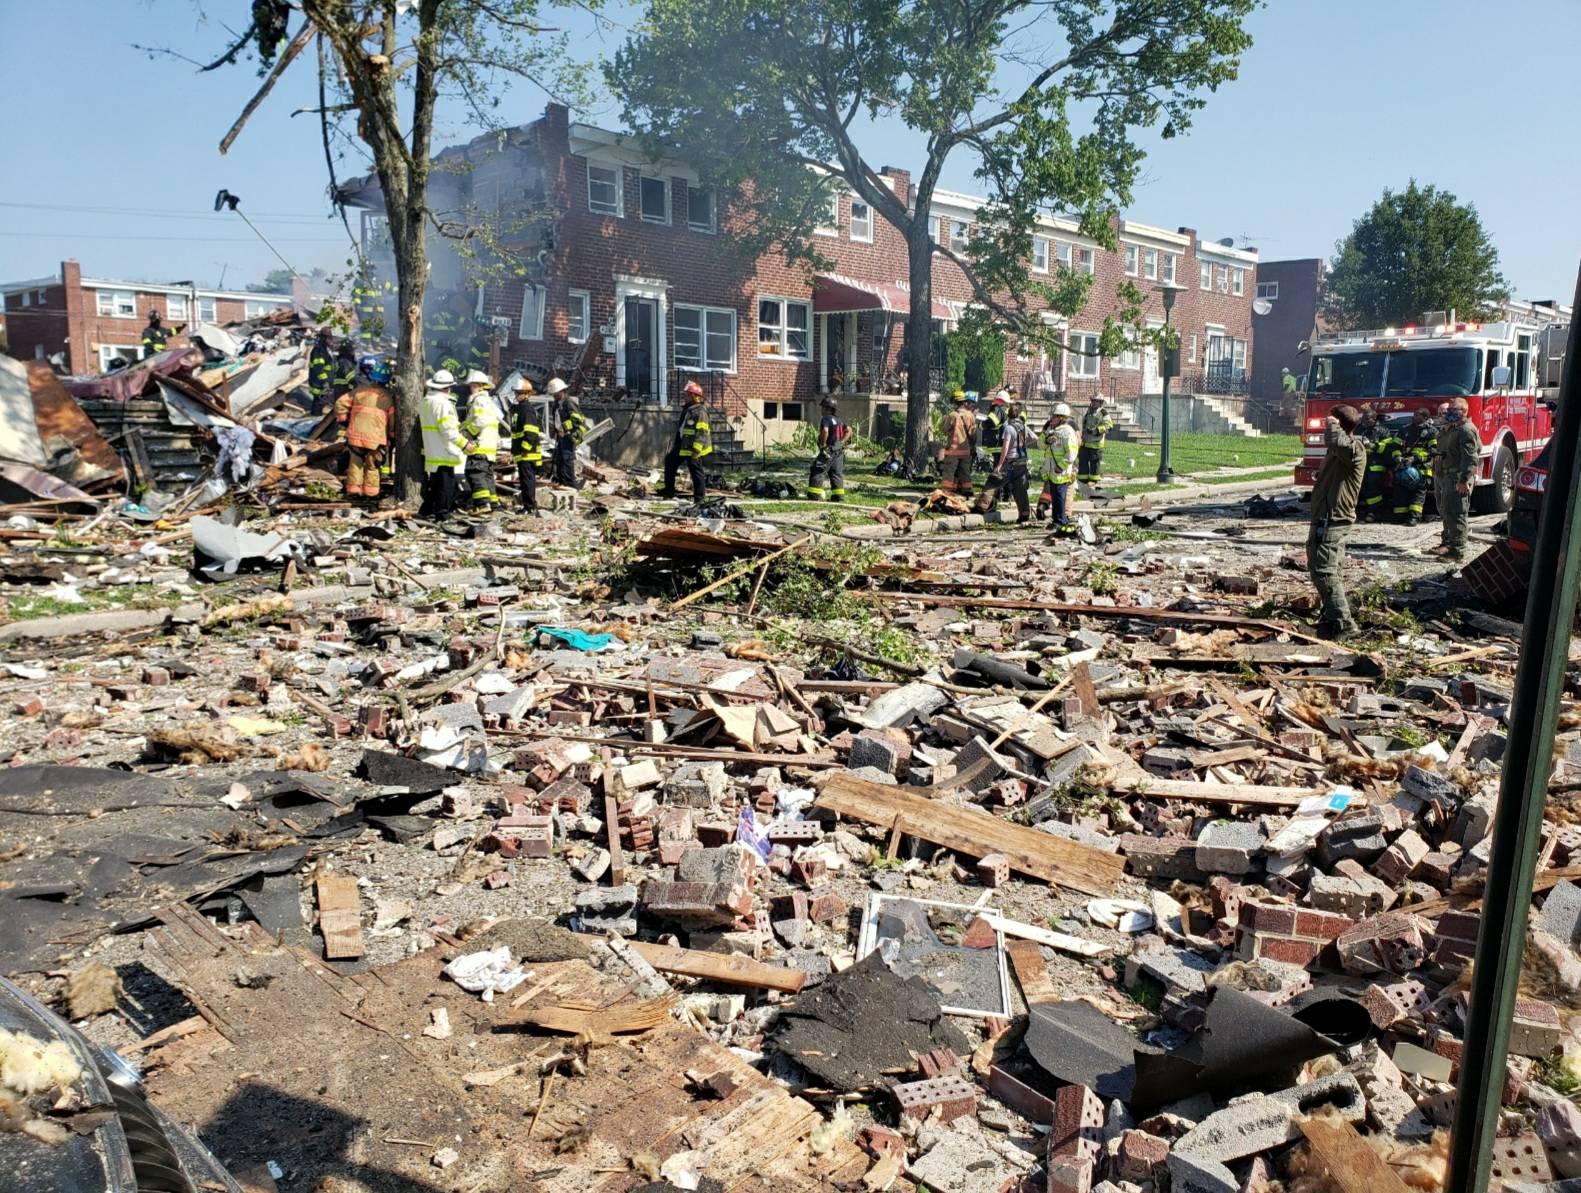 baltimore explosion - photo #10